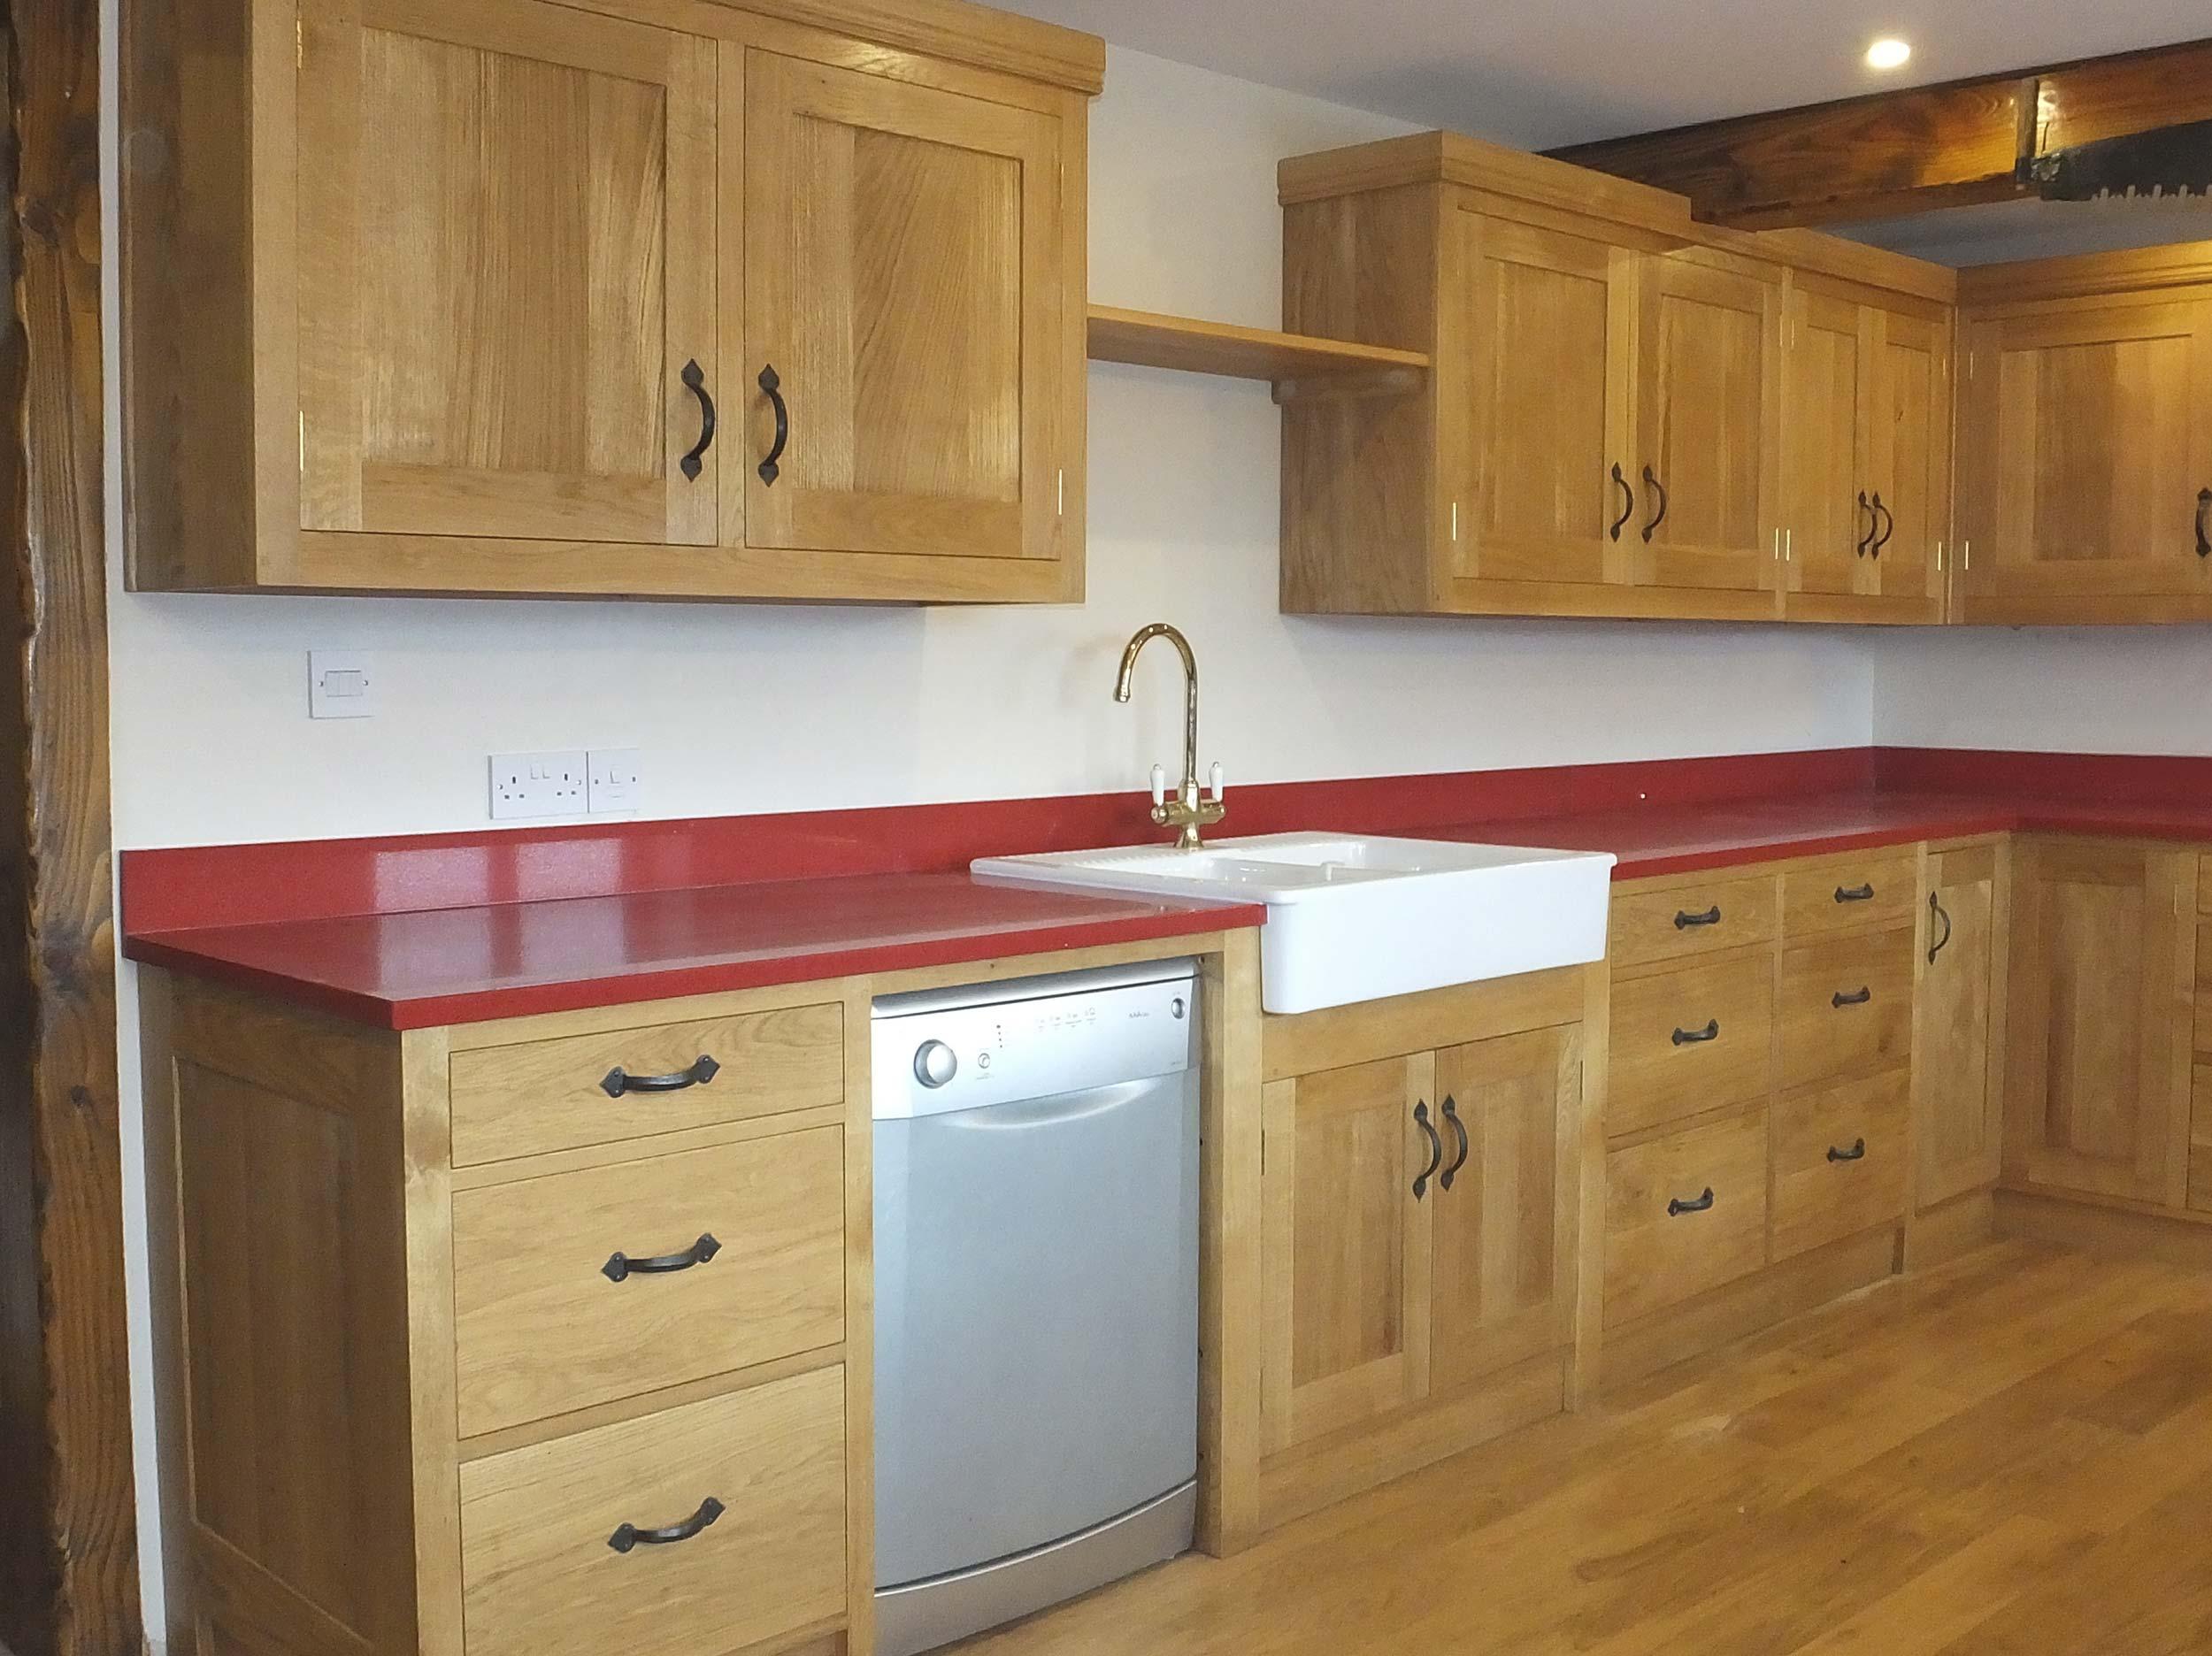 European Oak Kitchen with Composite Worktops